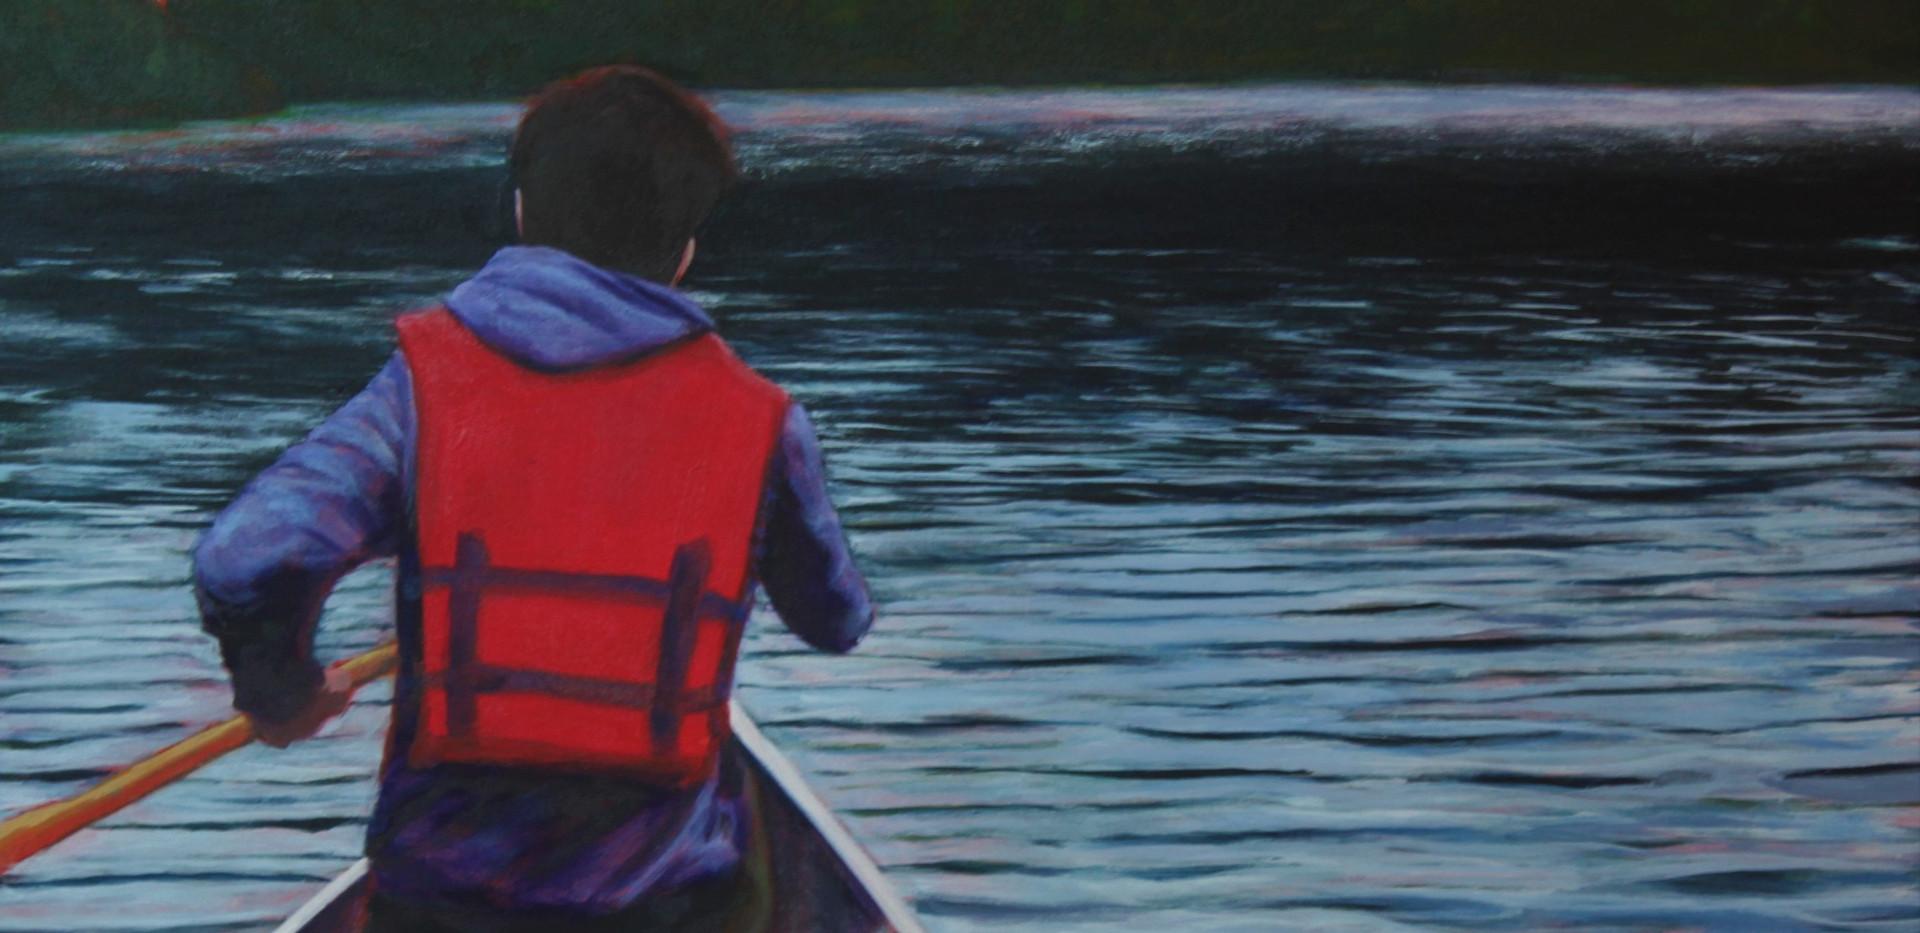 Nicholas in the Canoe